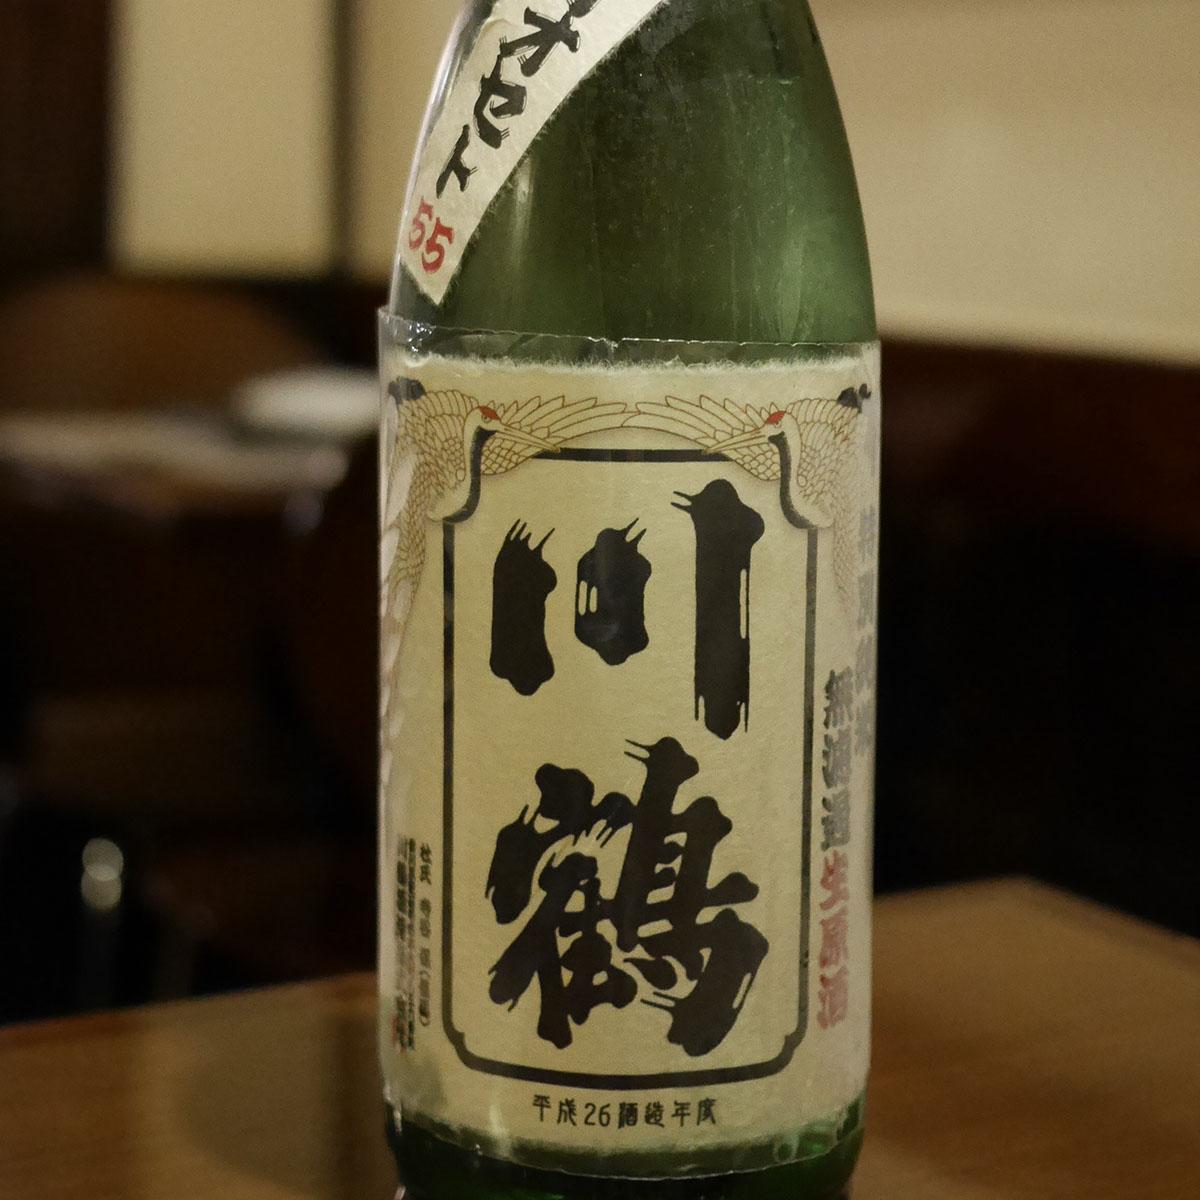 川鶴 讃州オオセト55 限定直汲み 純米生原酒